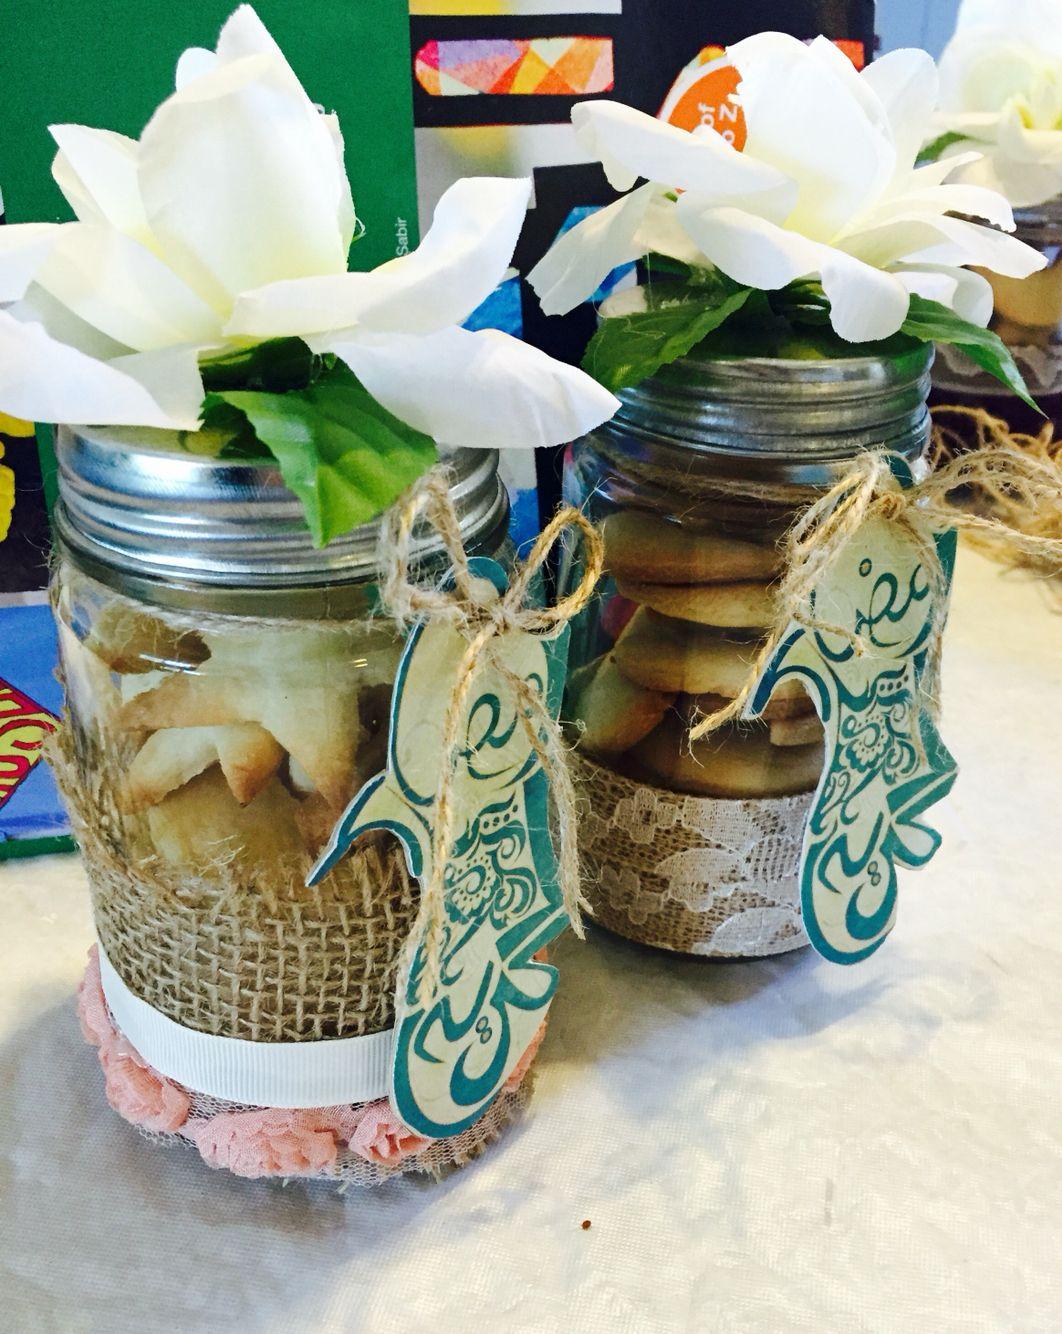 Ramadan Cookie Jars To Give Away As Simple Ramadan Gifts Made And Designed By Me Ramadan Gifts Eid Activities Ramadan Decorations